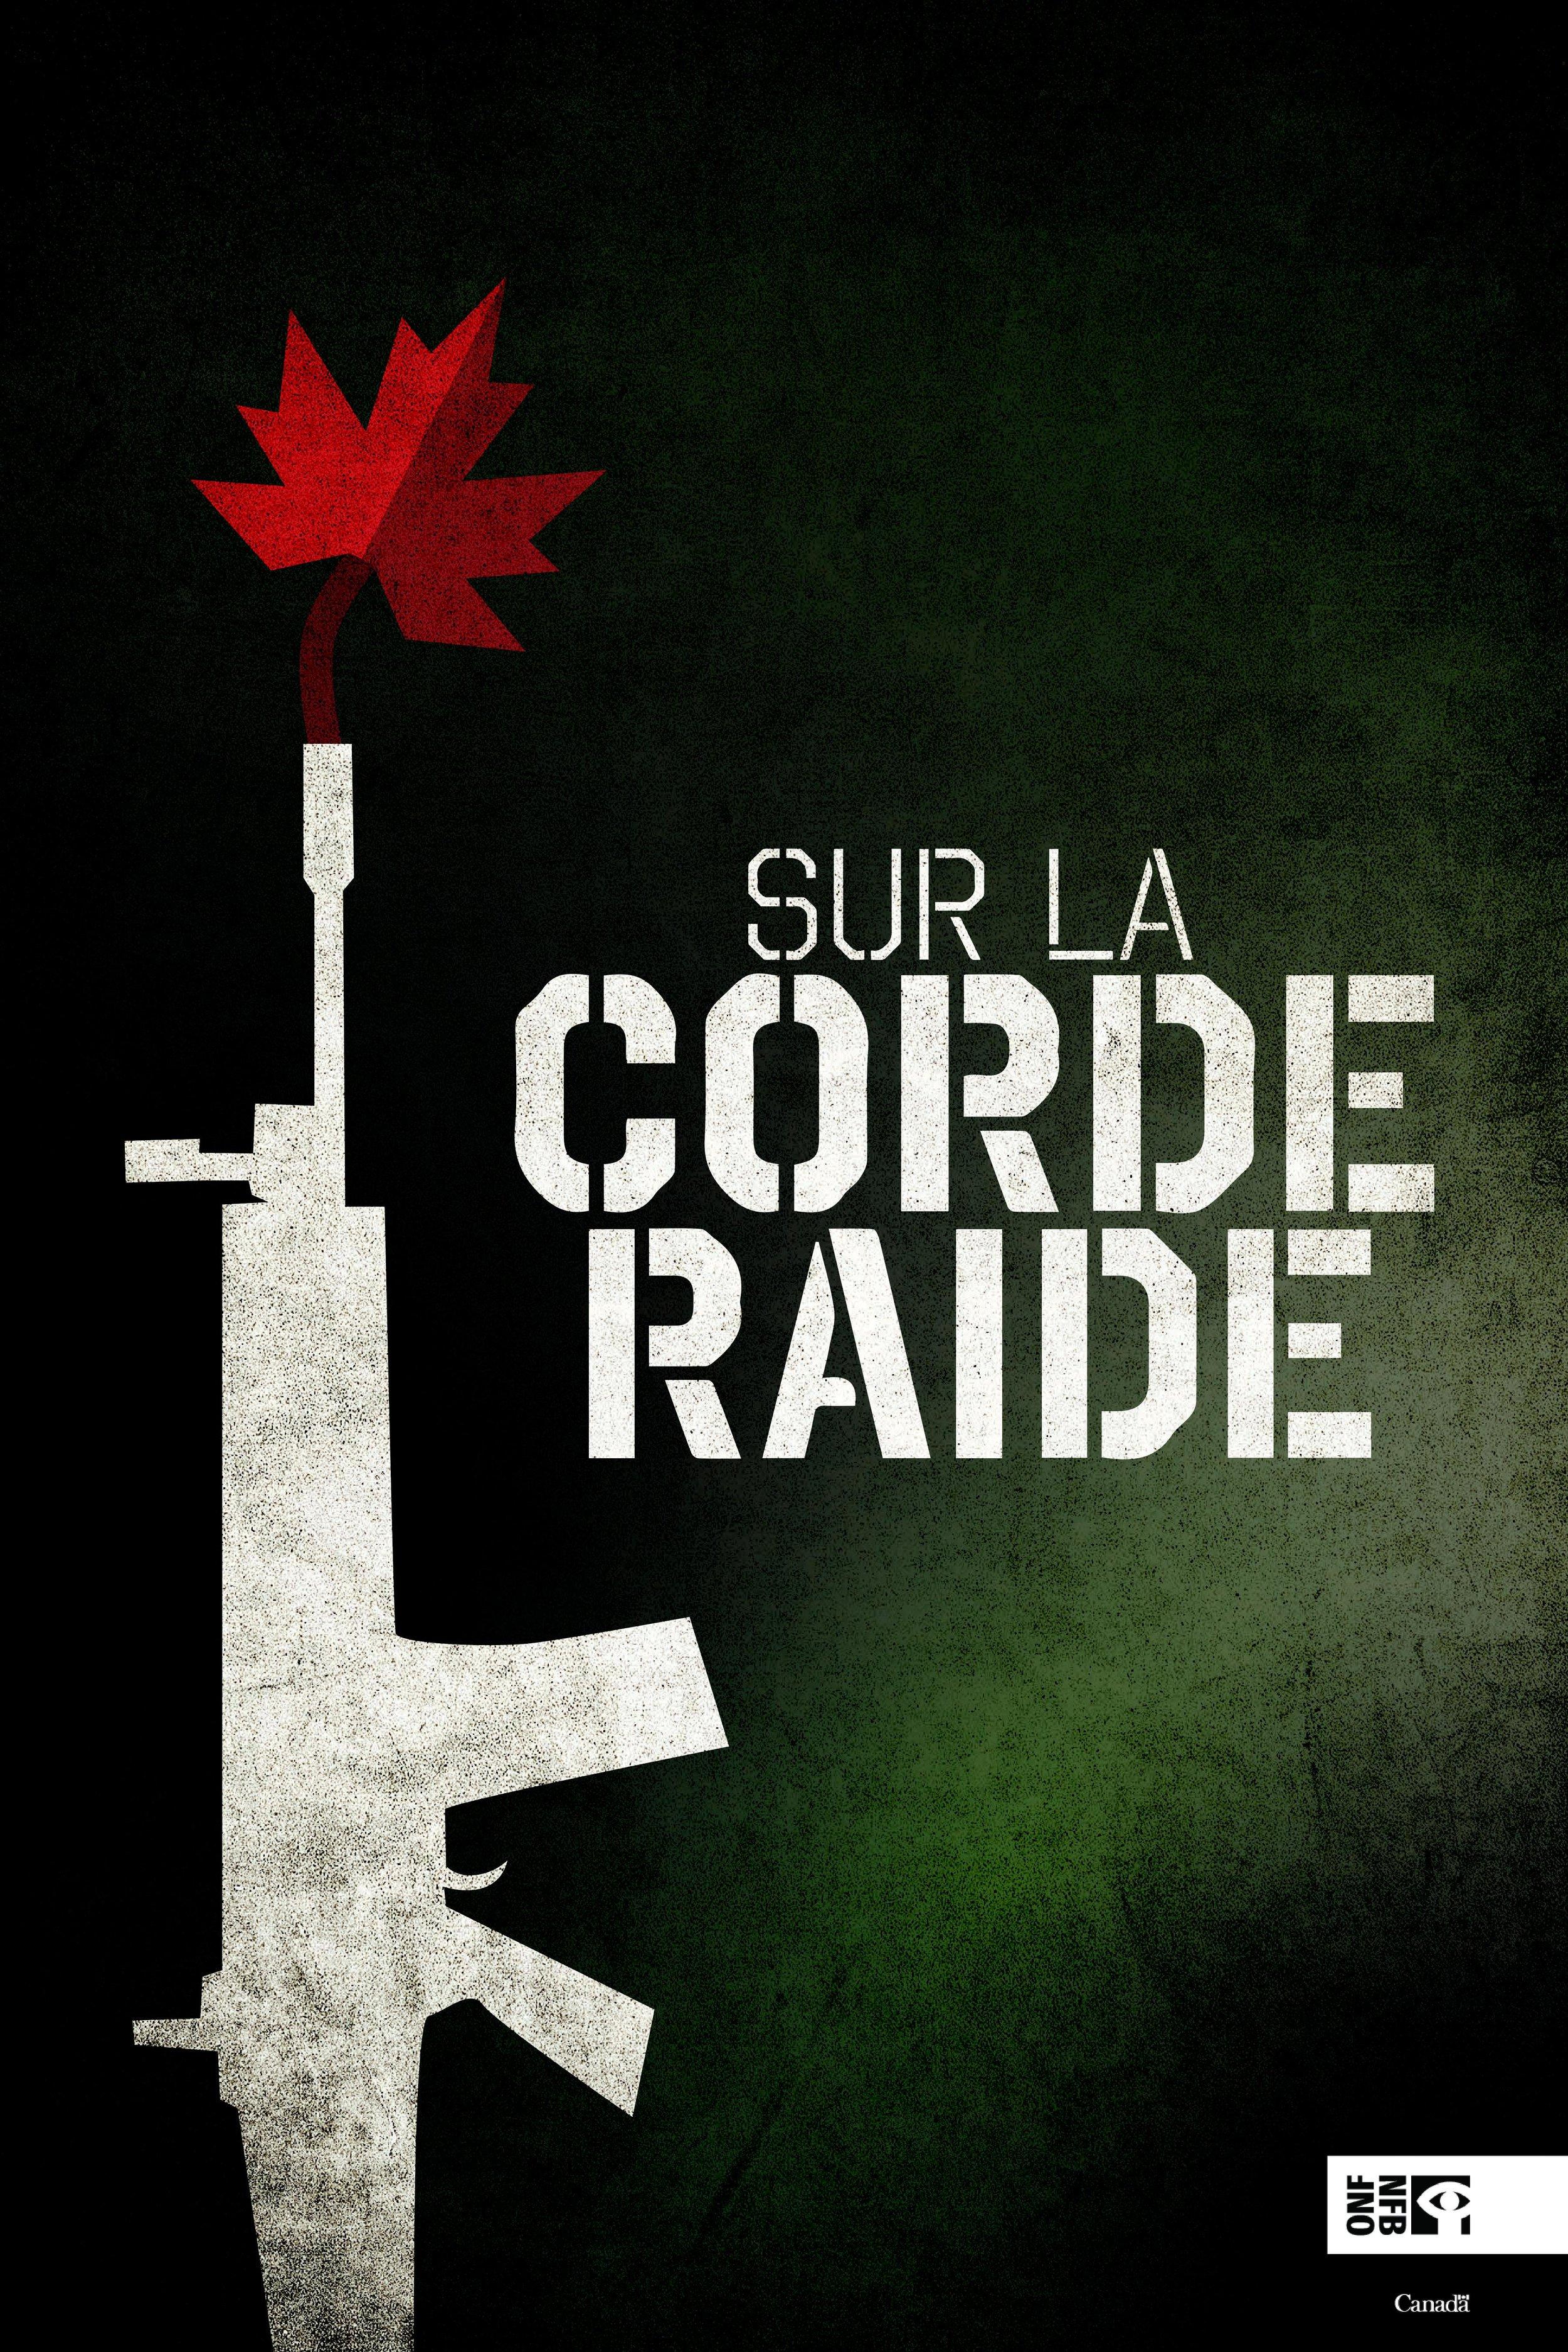 SURLACORDERAIDE-LaCamaraderie-Poster-1mars-01 (1)_00004.jpg